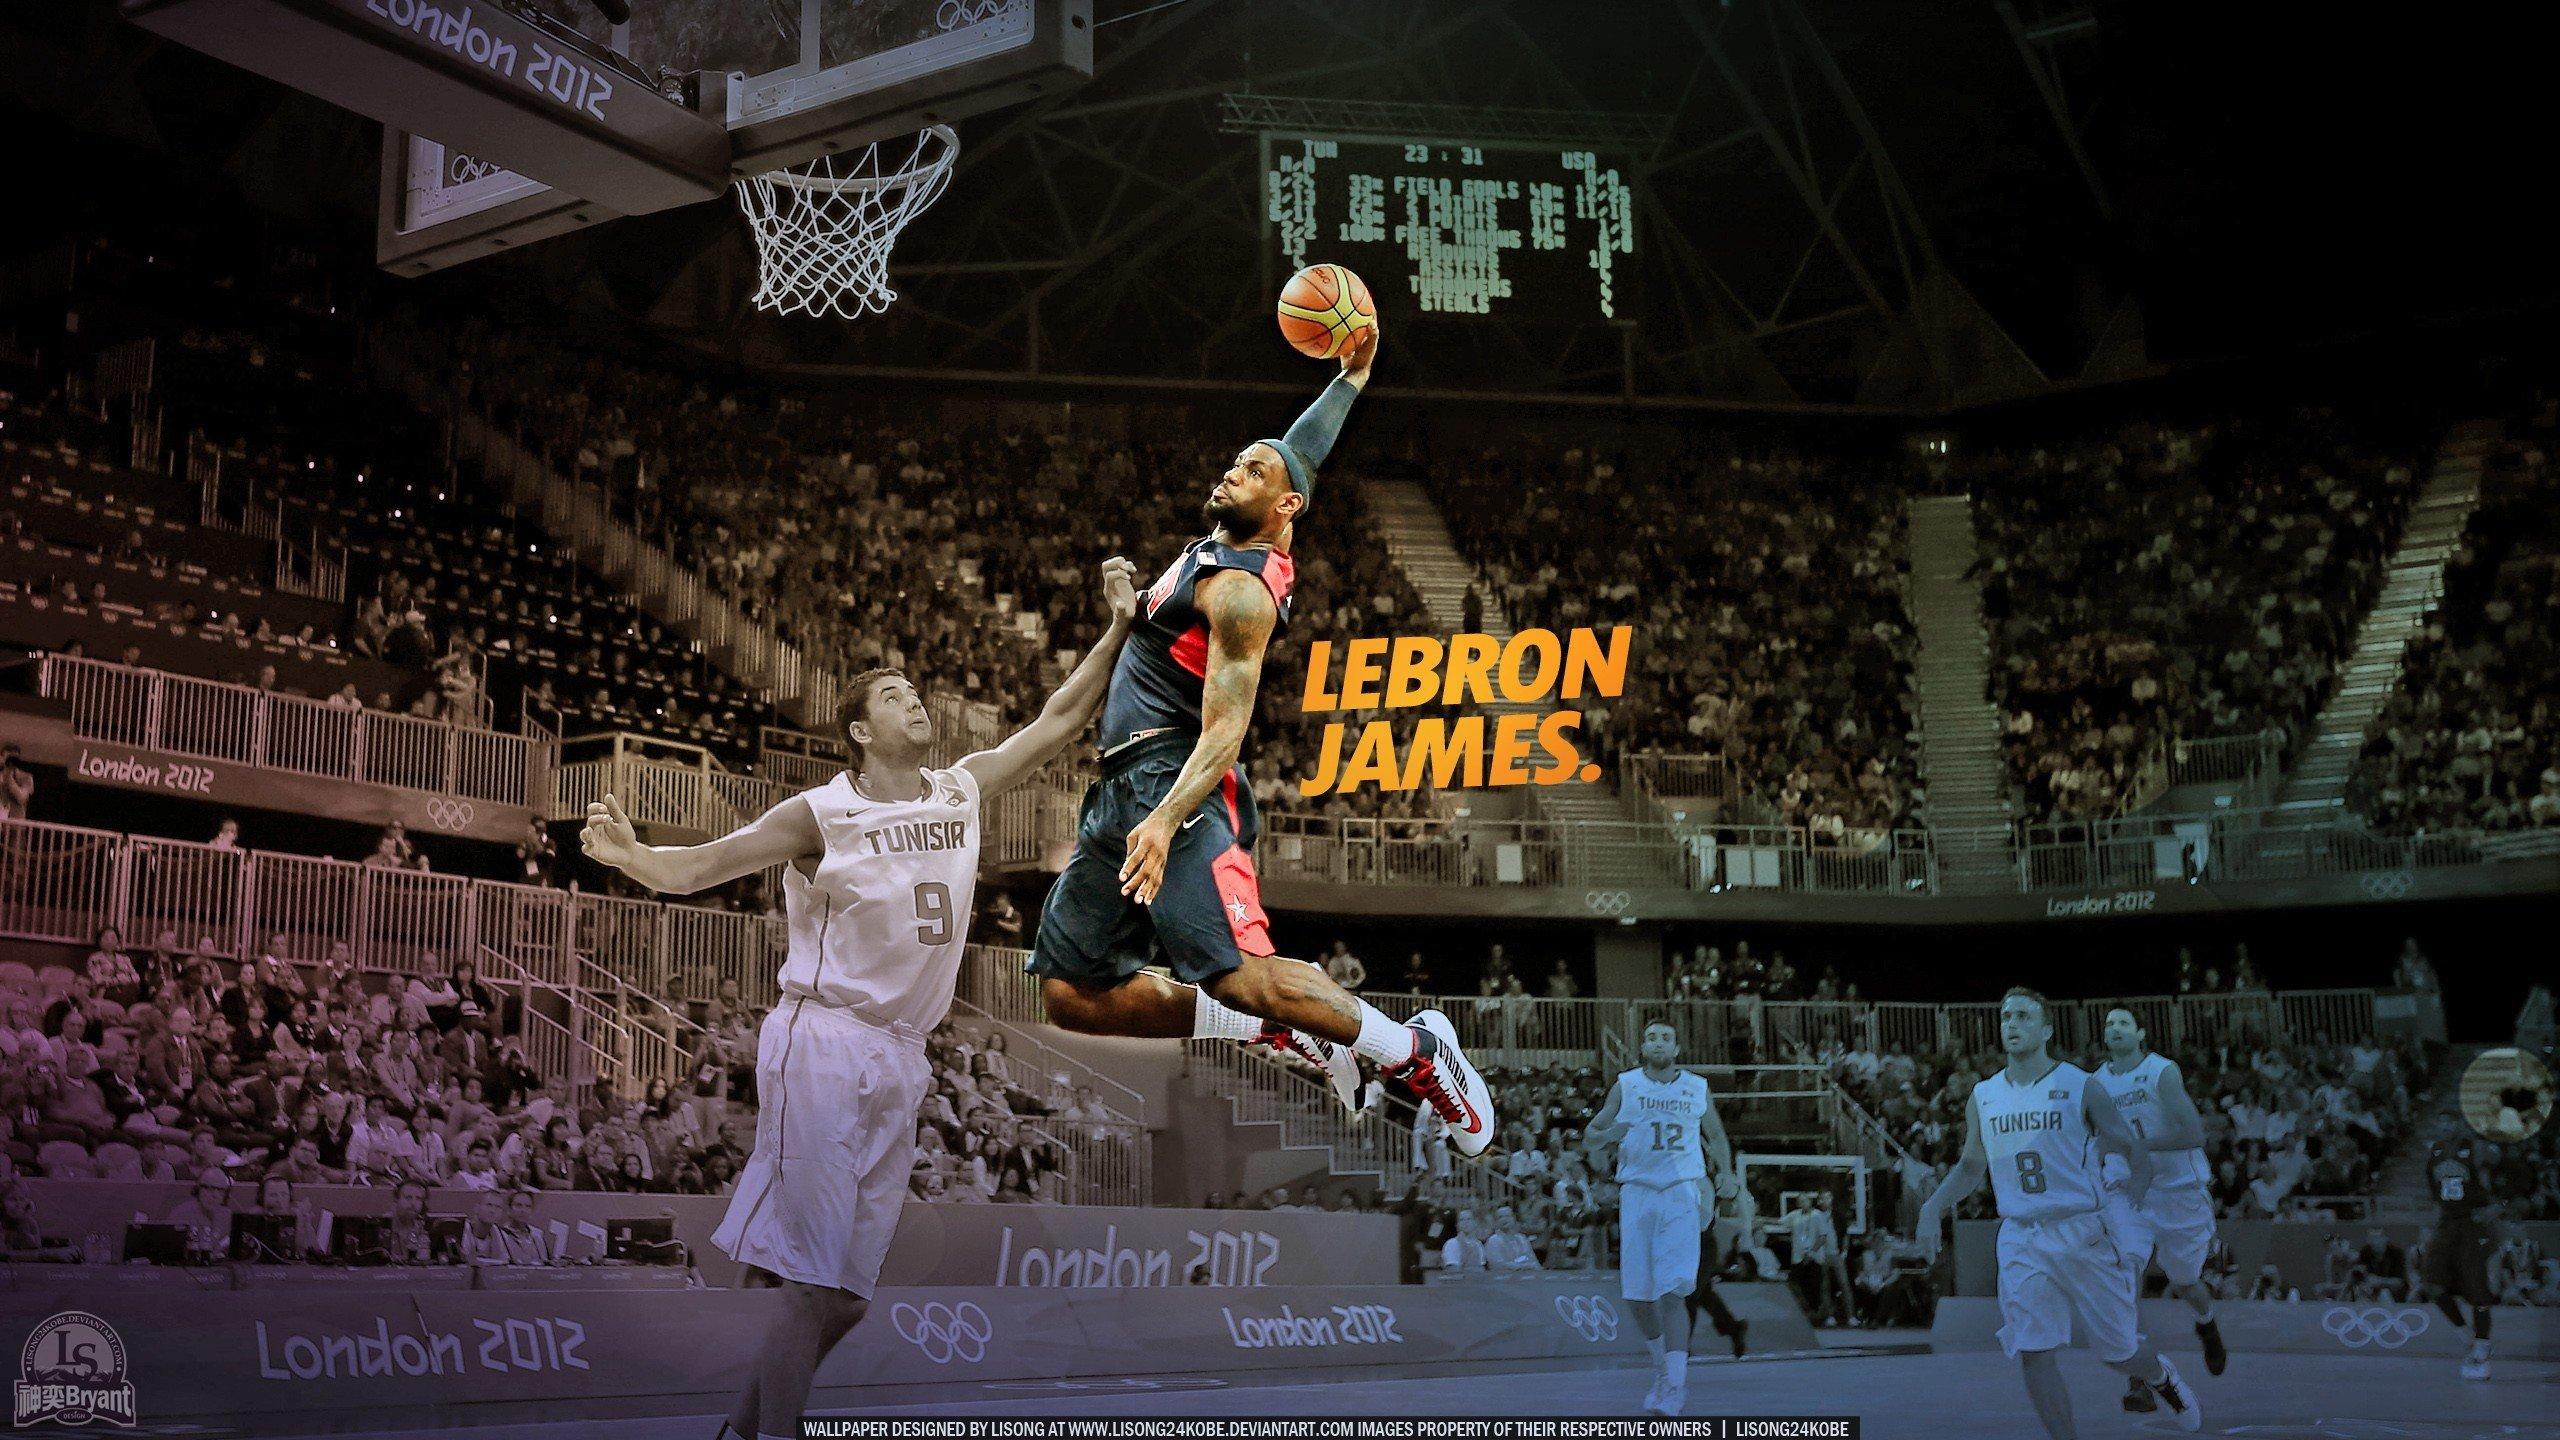 NBA Lebron James dunk basketball player wallpaper background 2560x1440